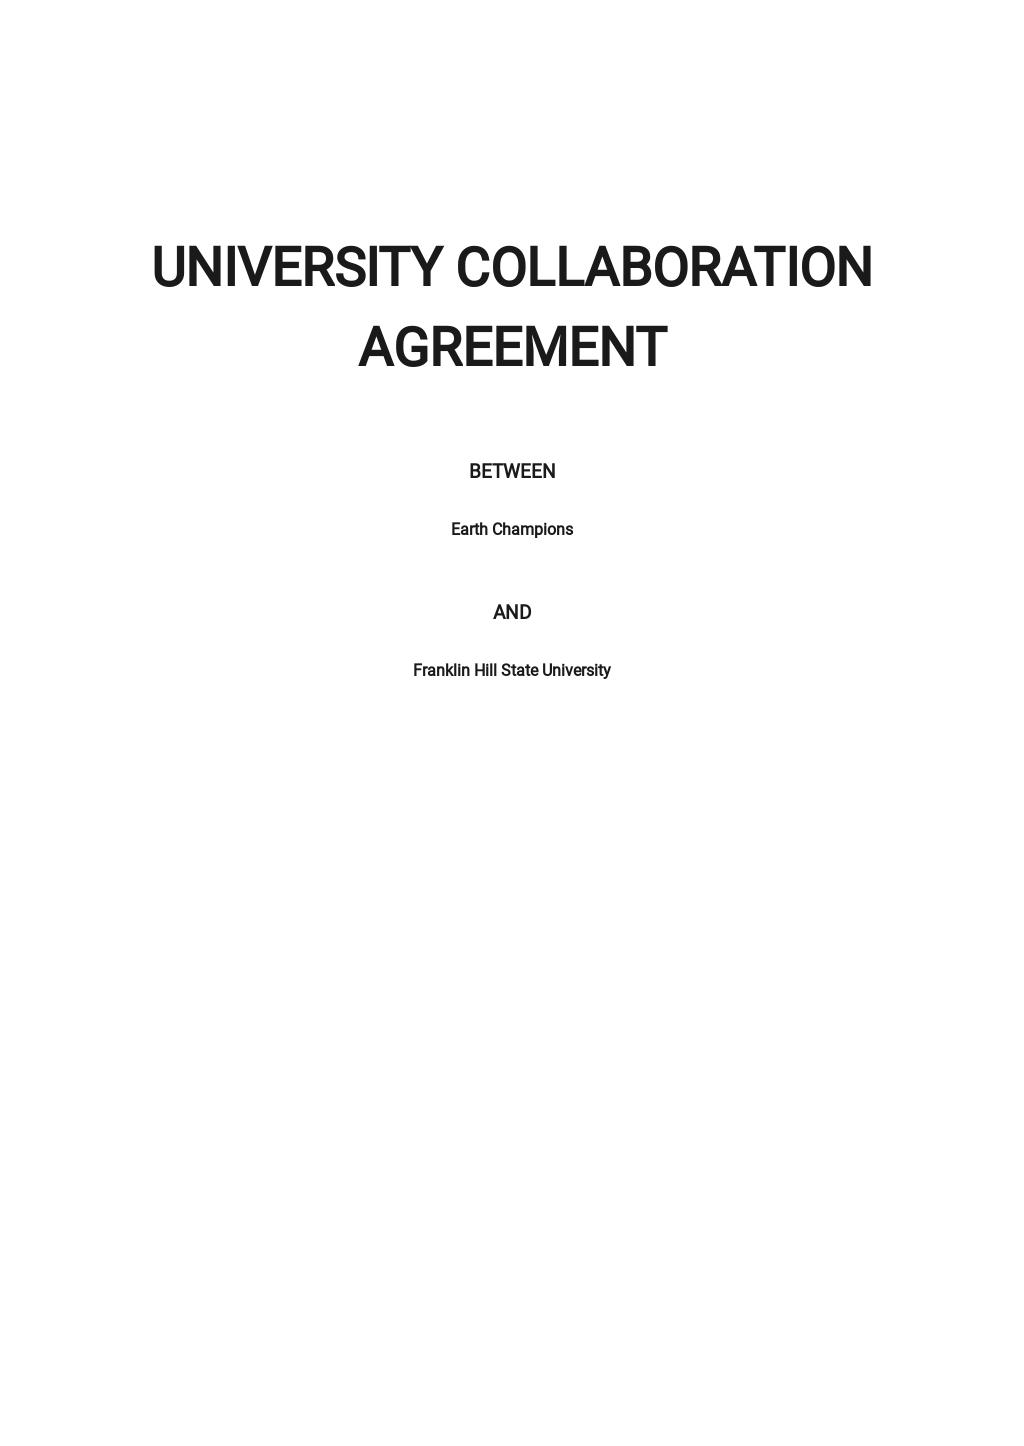 University Collaboration Agreement Template.jpe